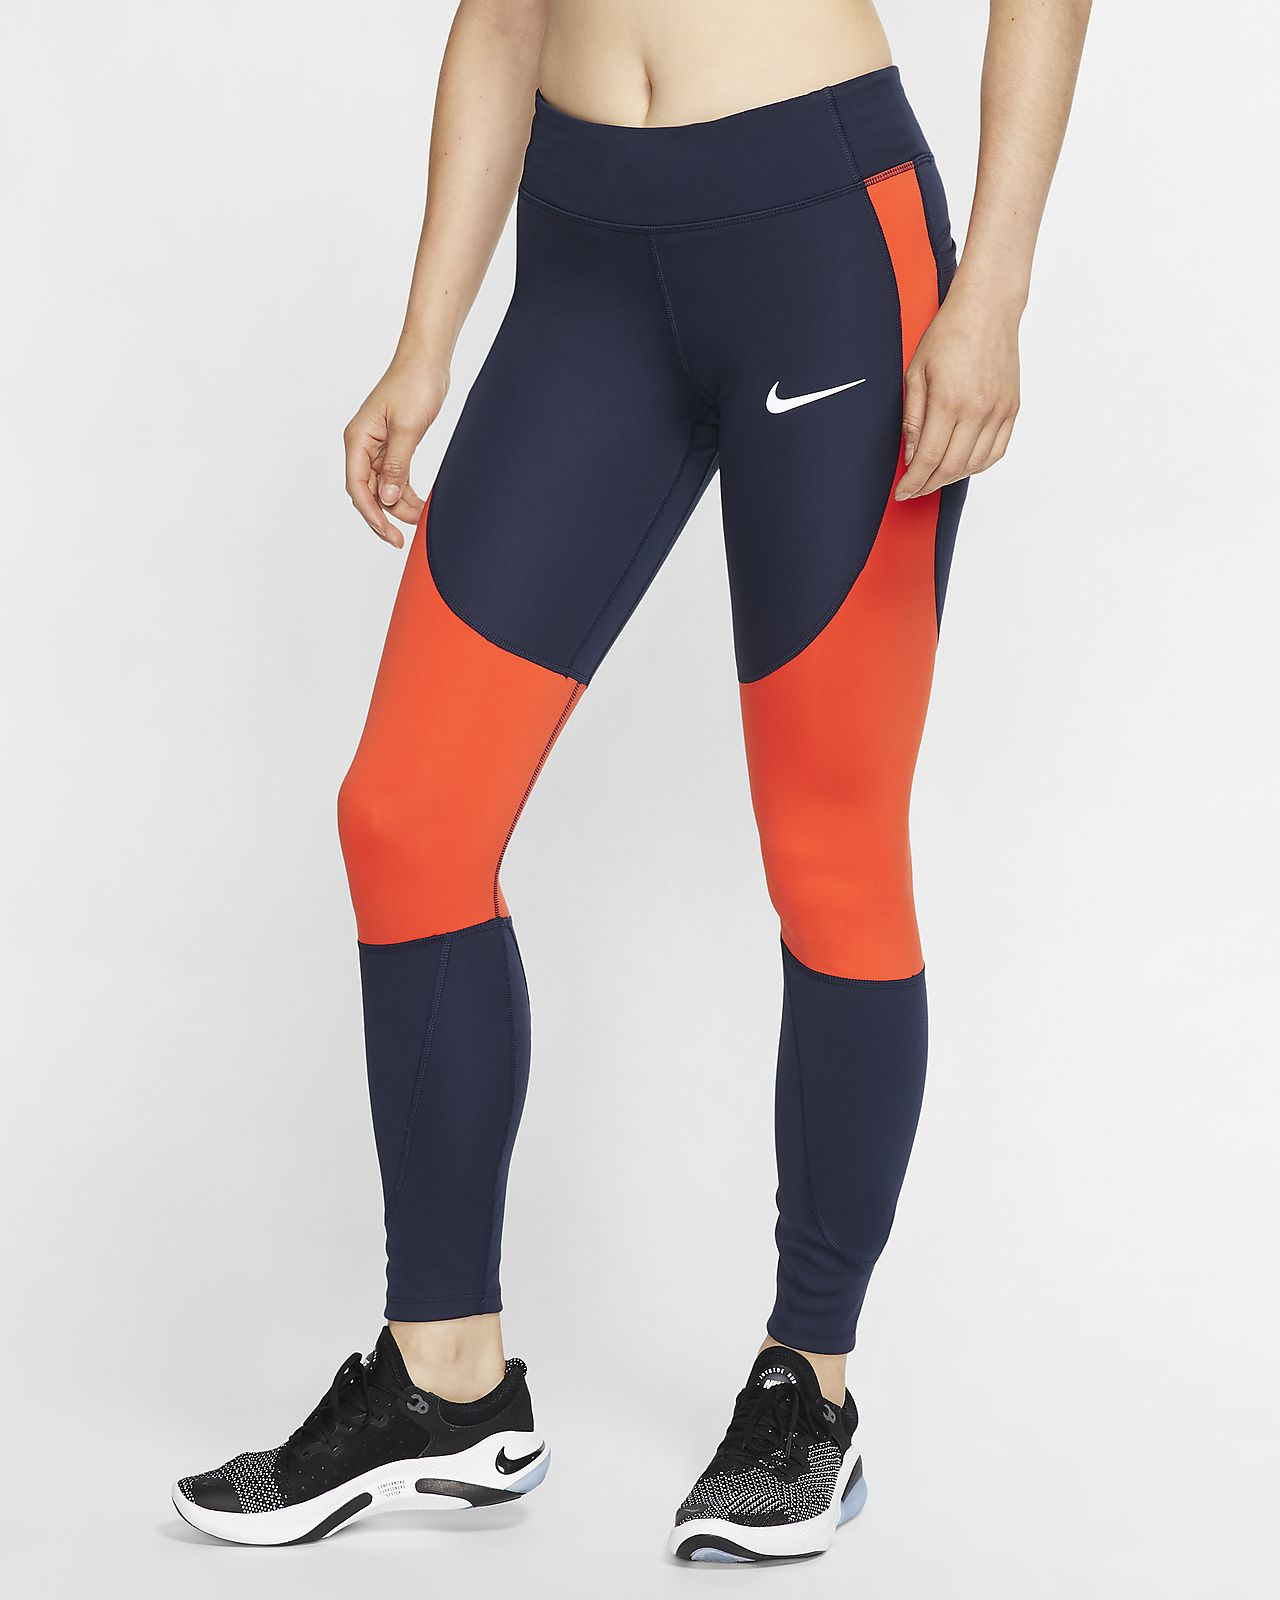 Leggings de running Nike Epic Lux Repel pour Femme